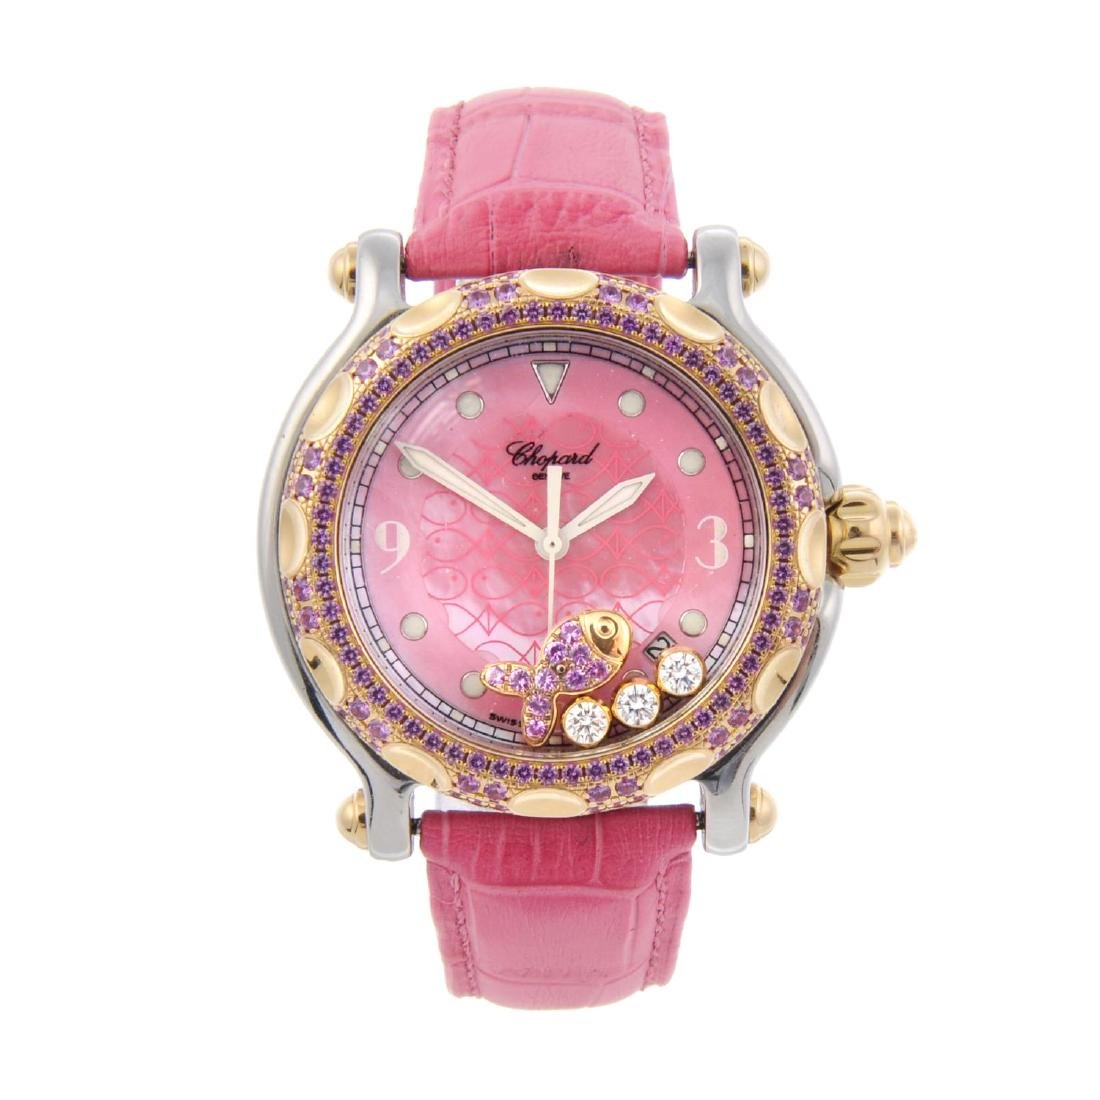 CHOPARD - a lady's Happy Sport wrist watch. Stainless